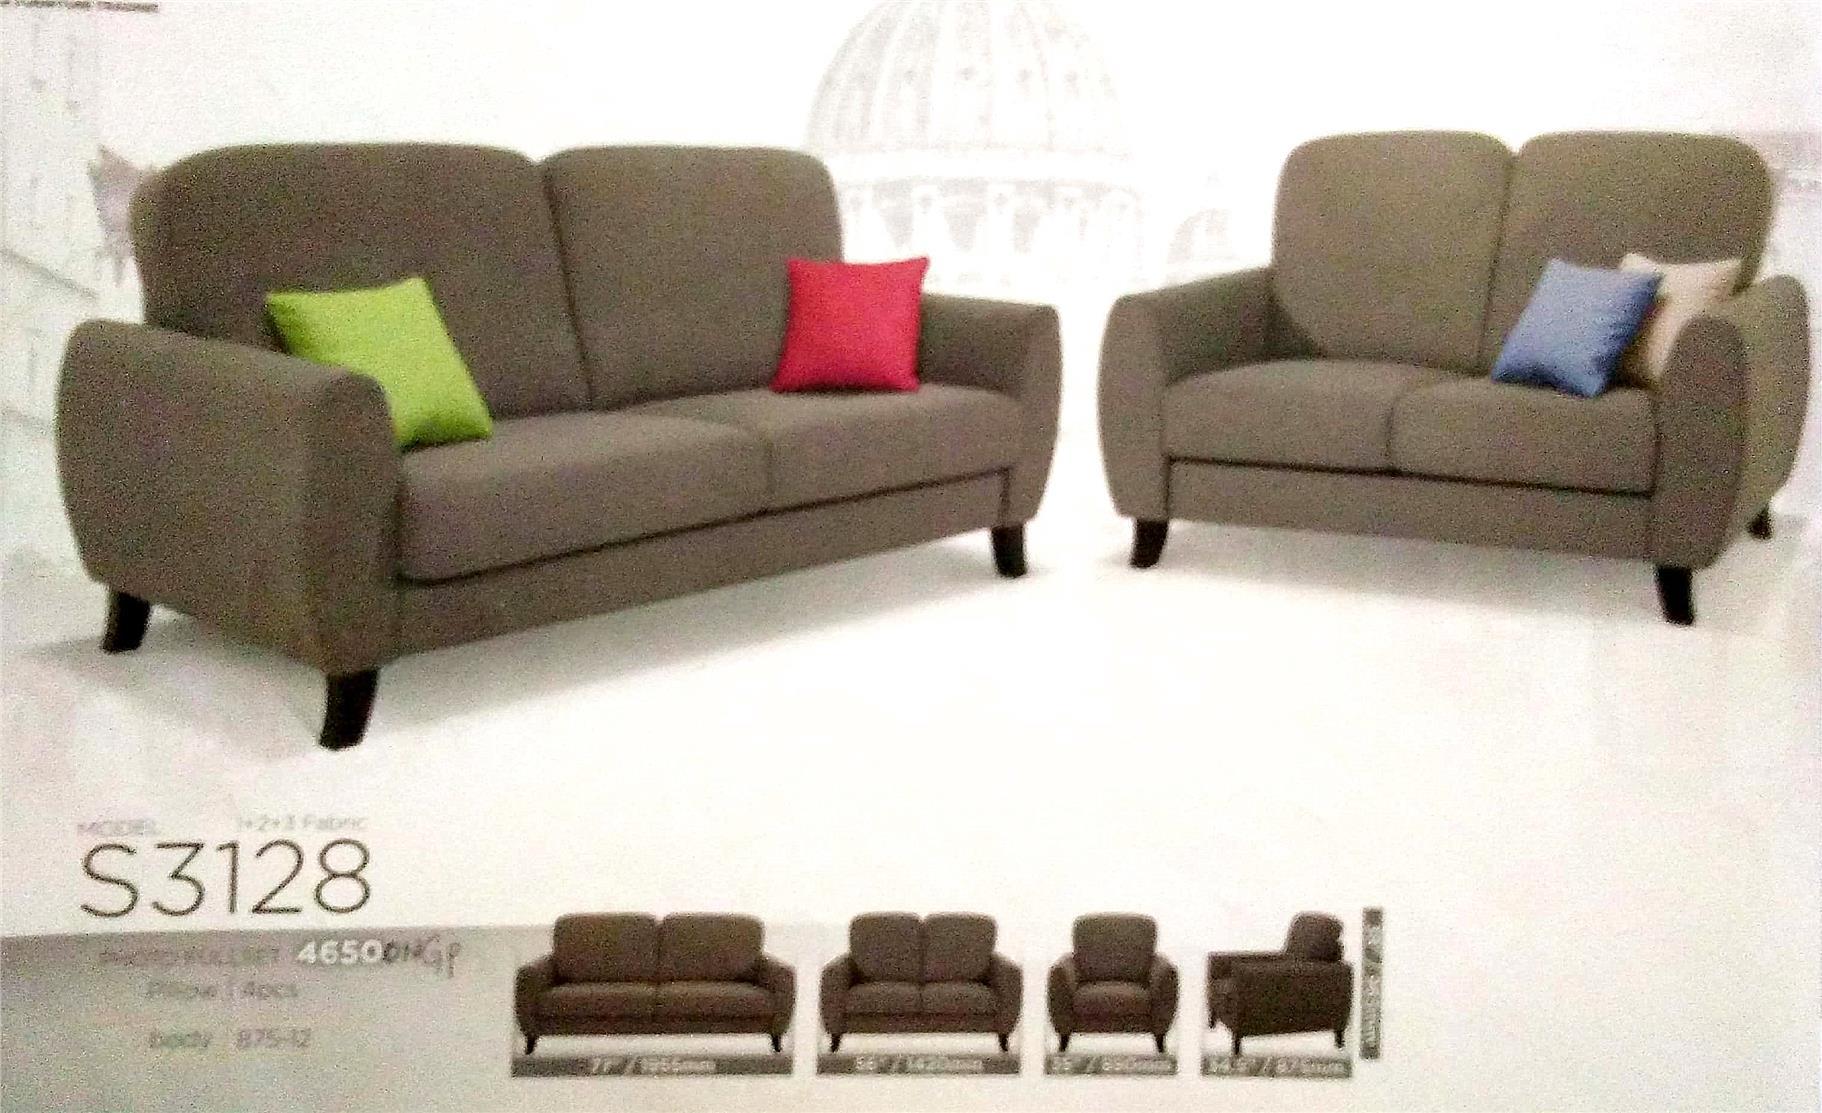 Sensational Installment Plan Sofa Set 3 2 1 3128 Download Free Architecture Designs Xoliawazosbritishbridgeorg